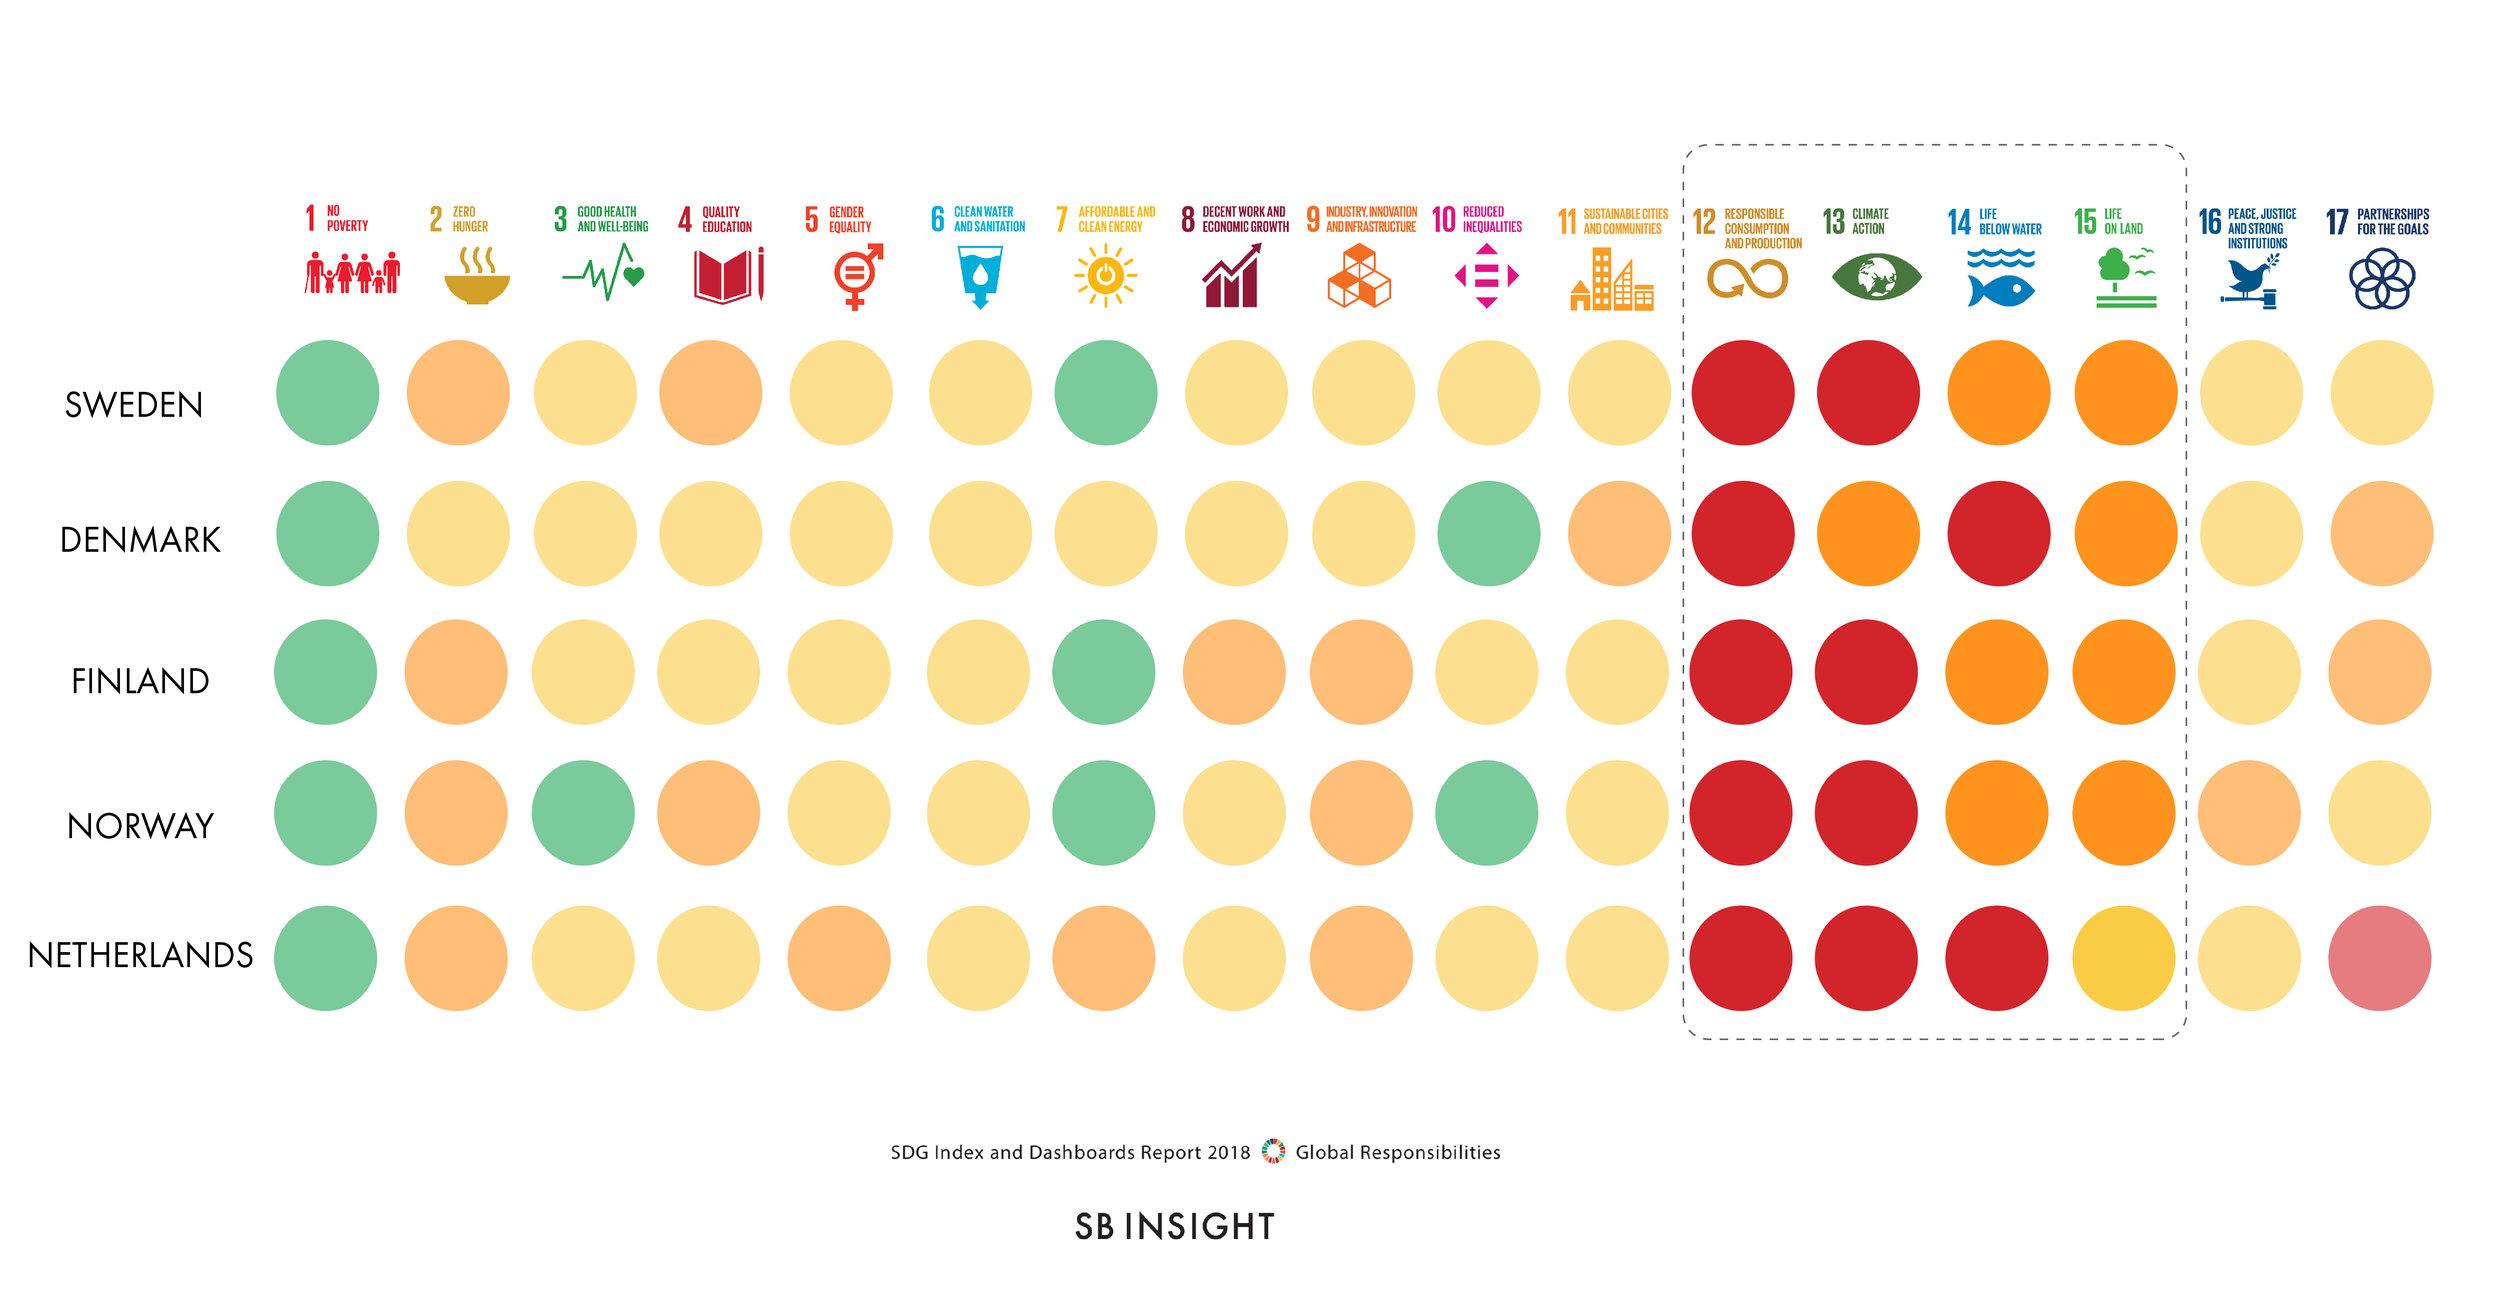 SDG-Progress-Nordics-NL-2018-02.jpg